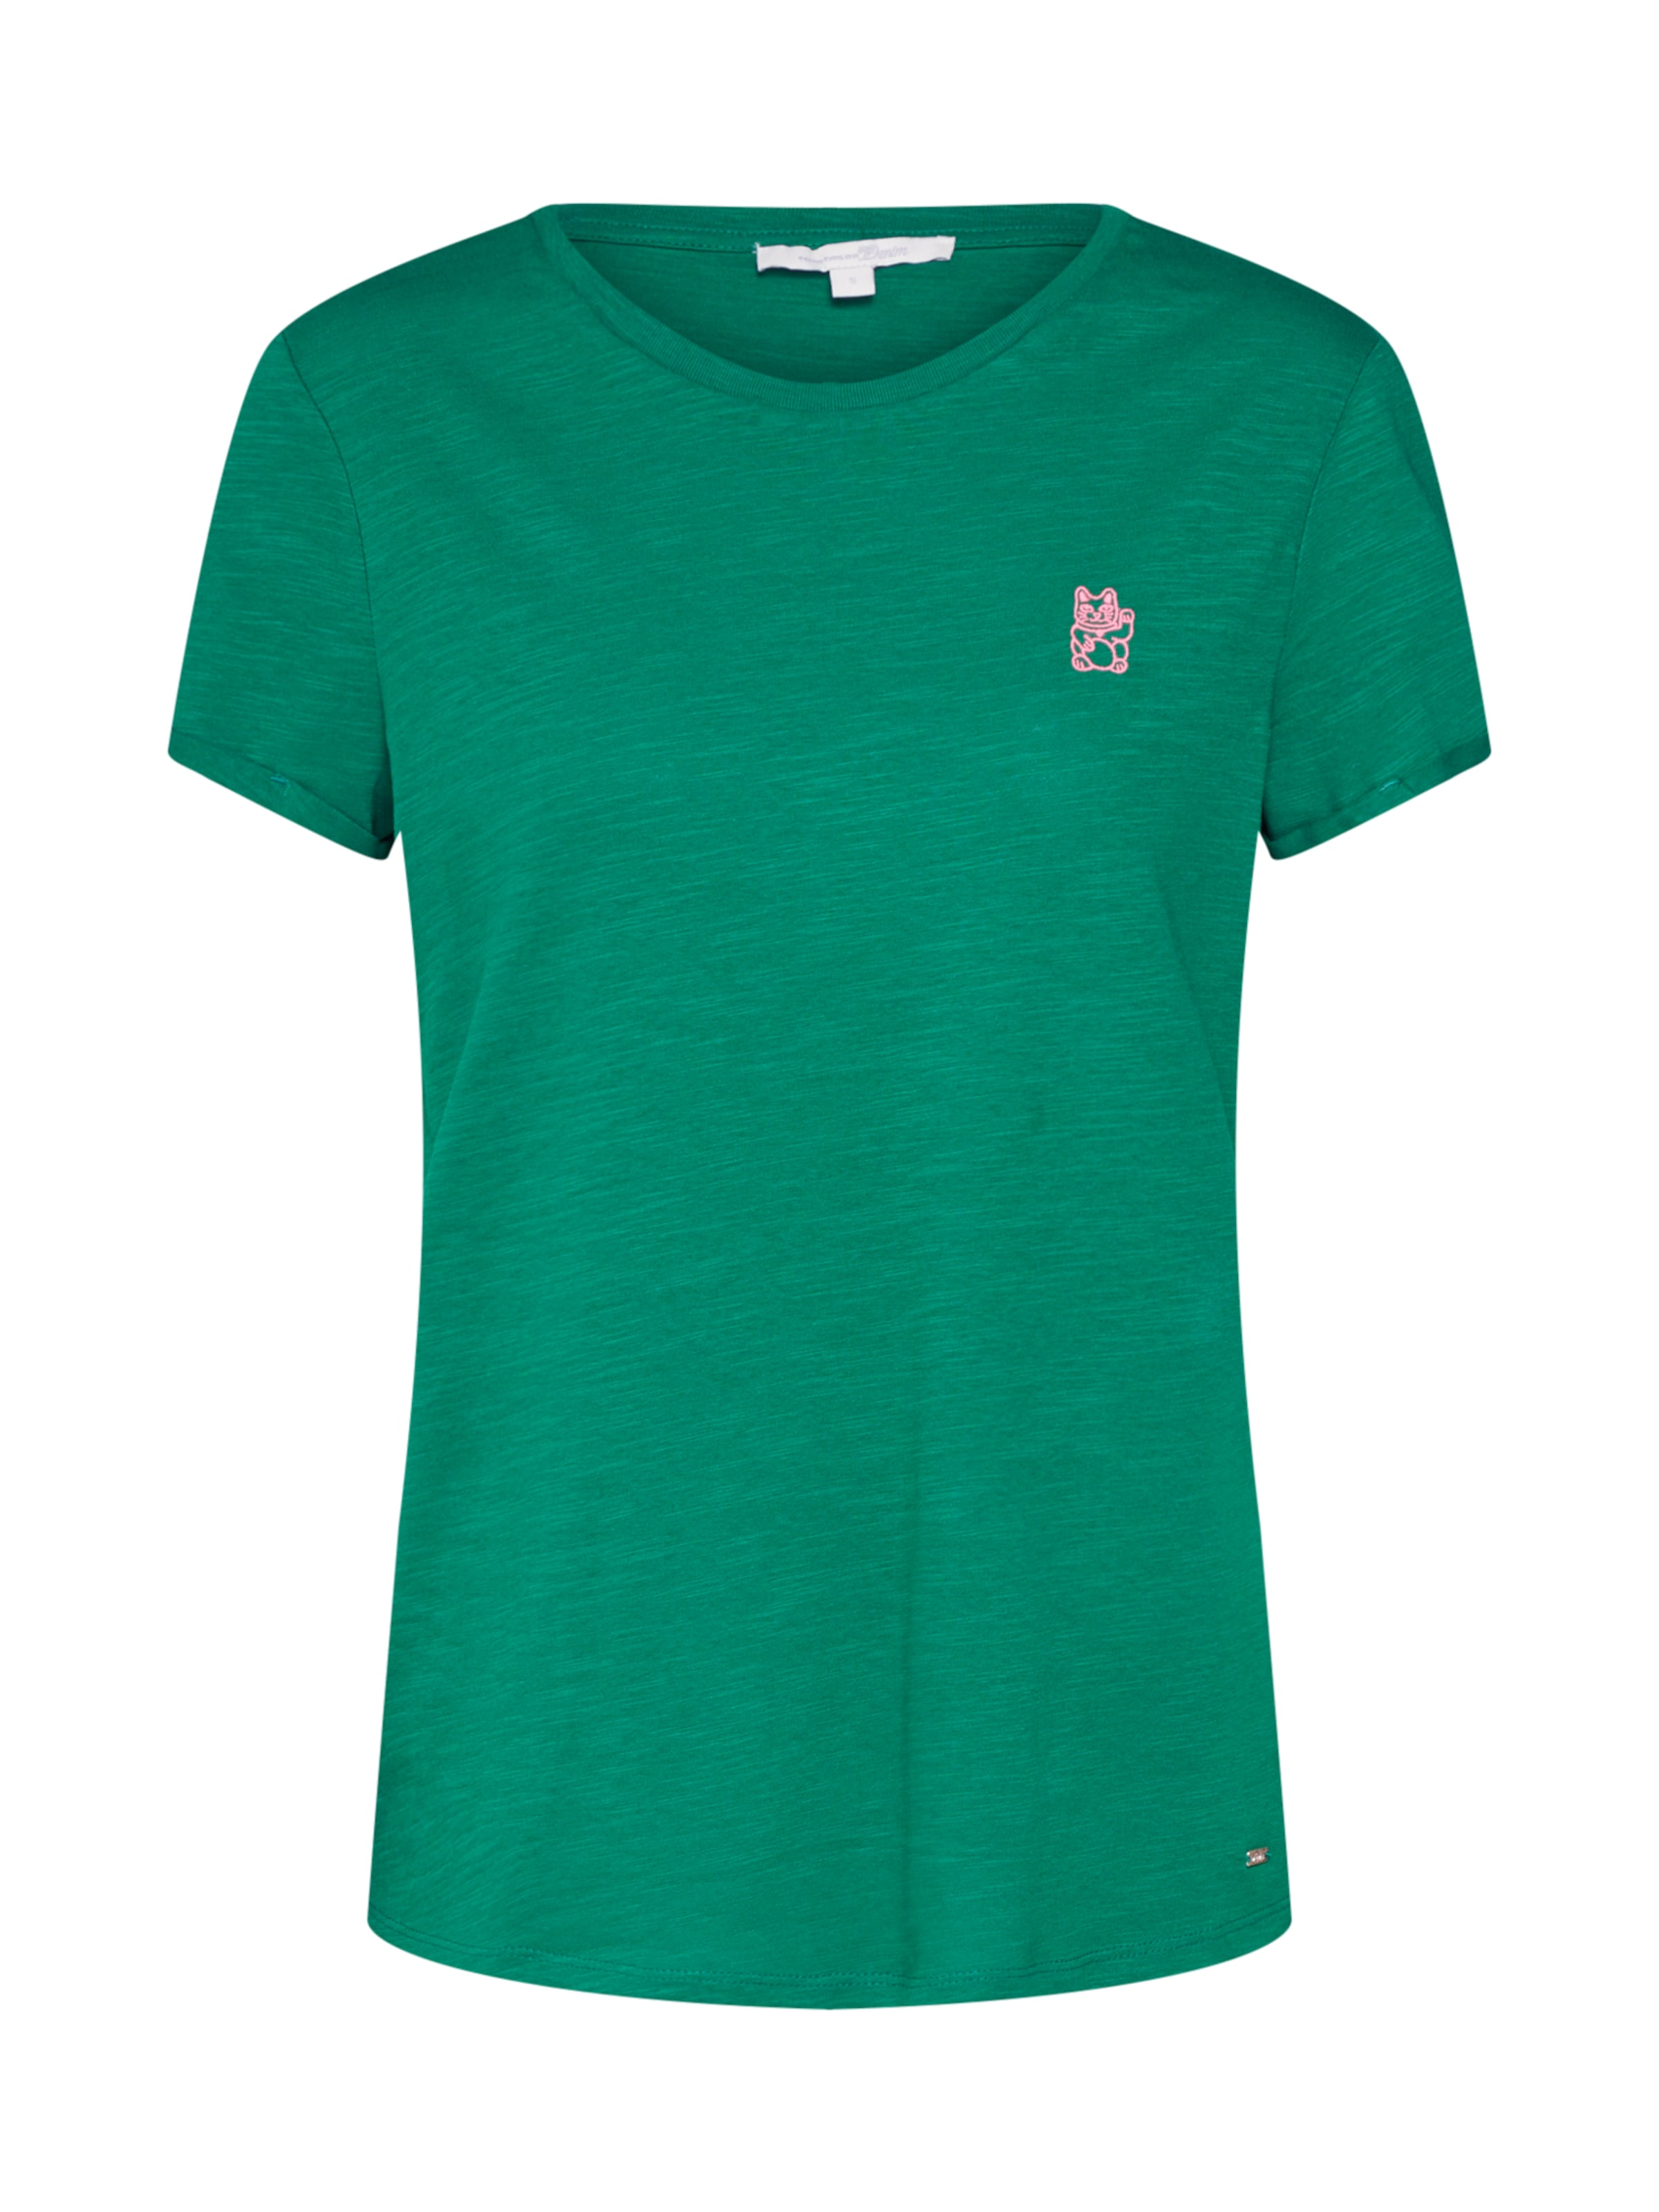 shirt Dunkelgrün T Denim In Tom Tailor eQordWCxB